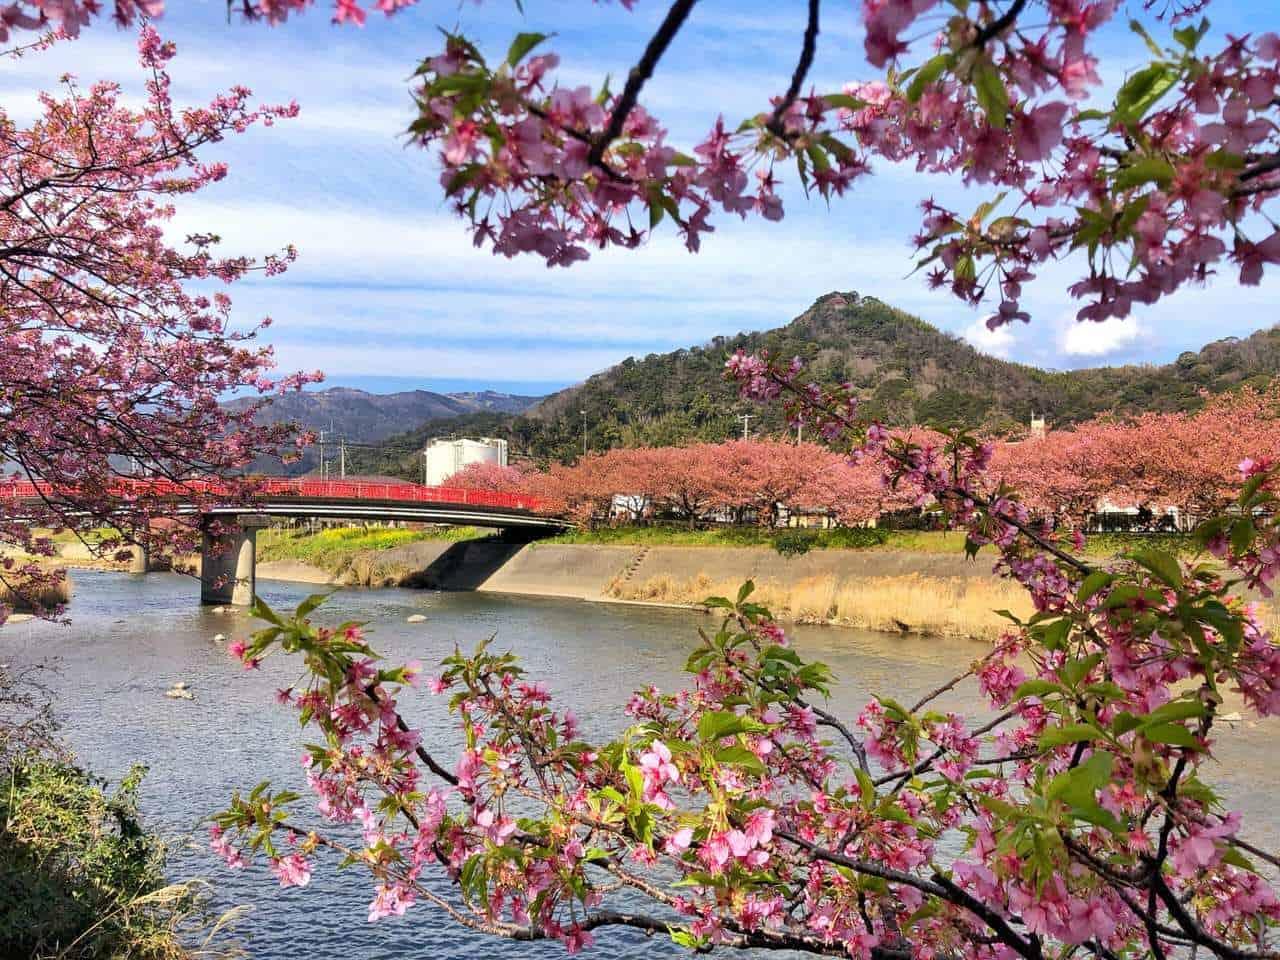 Early Cherry Blossom Viewing Near Tokyo in Kawazu, Shizuoka